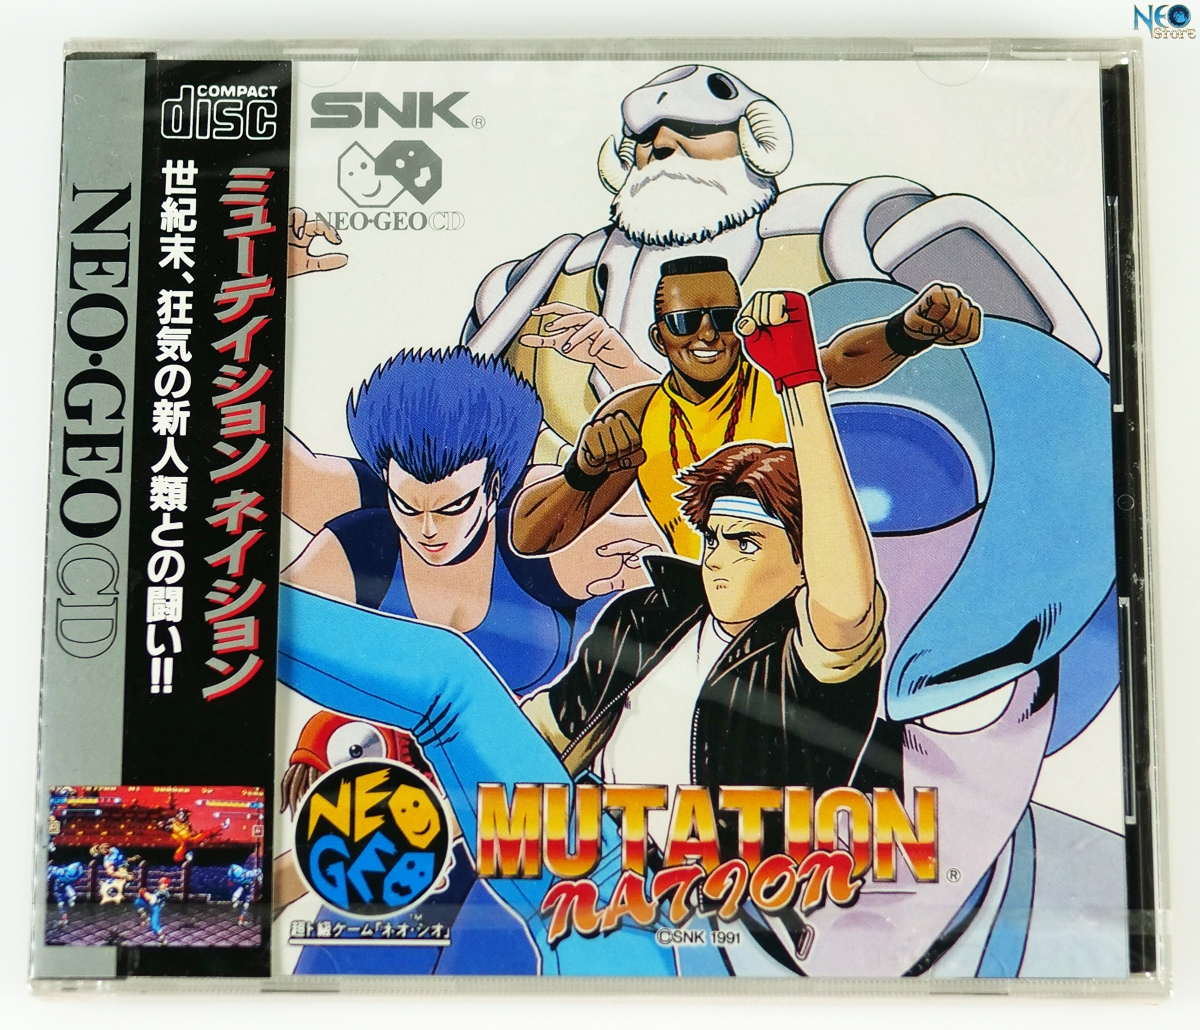 Neo Geo CD Mutation Nation Reproduction